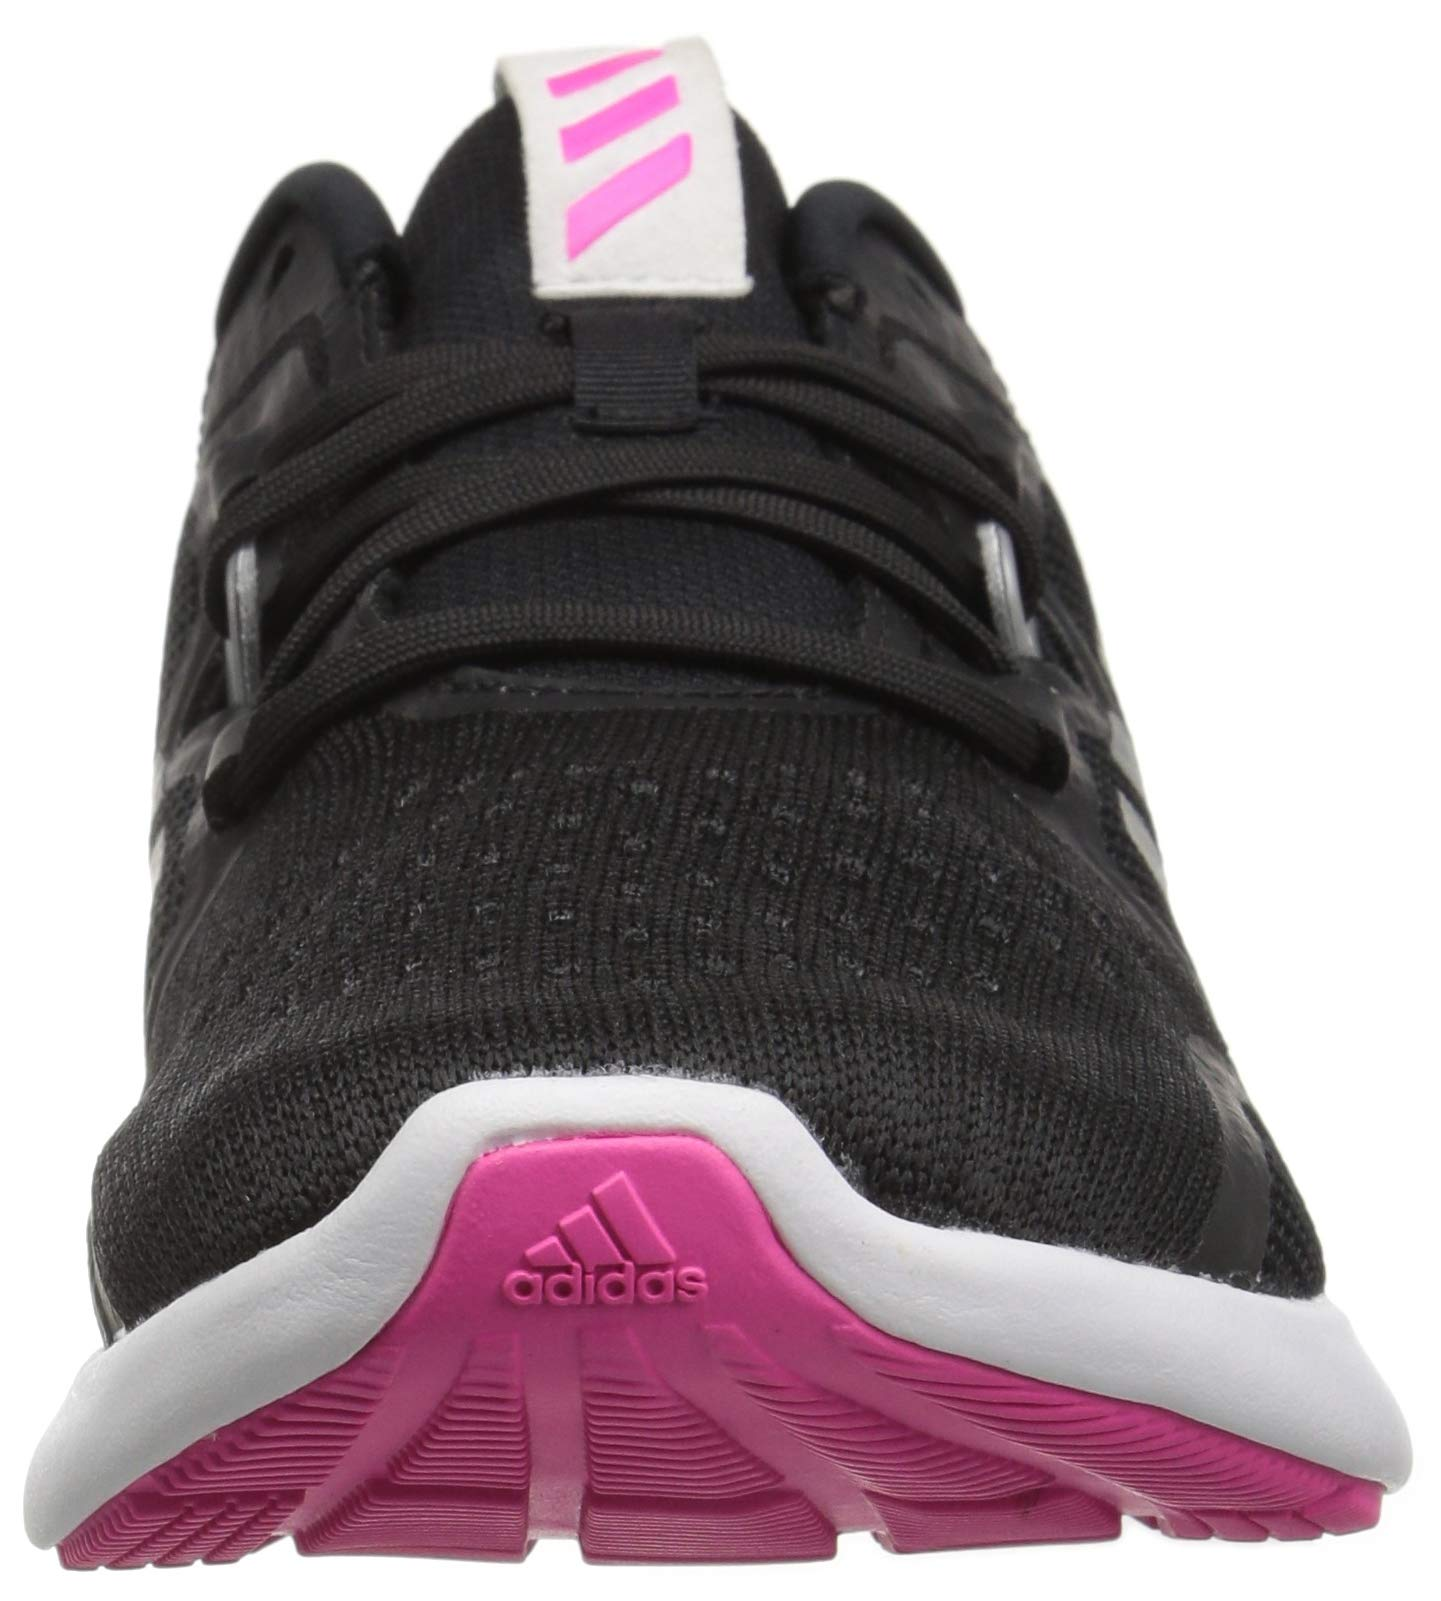 adidas Women's EdgeBounce Running Shoe, Black/Silver Metallic/Shock Pink, 5 M US by adidas (Image #4)